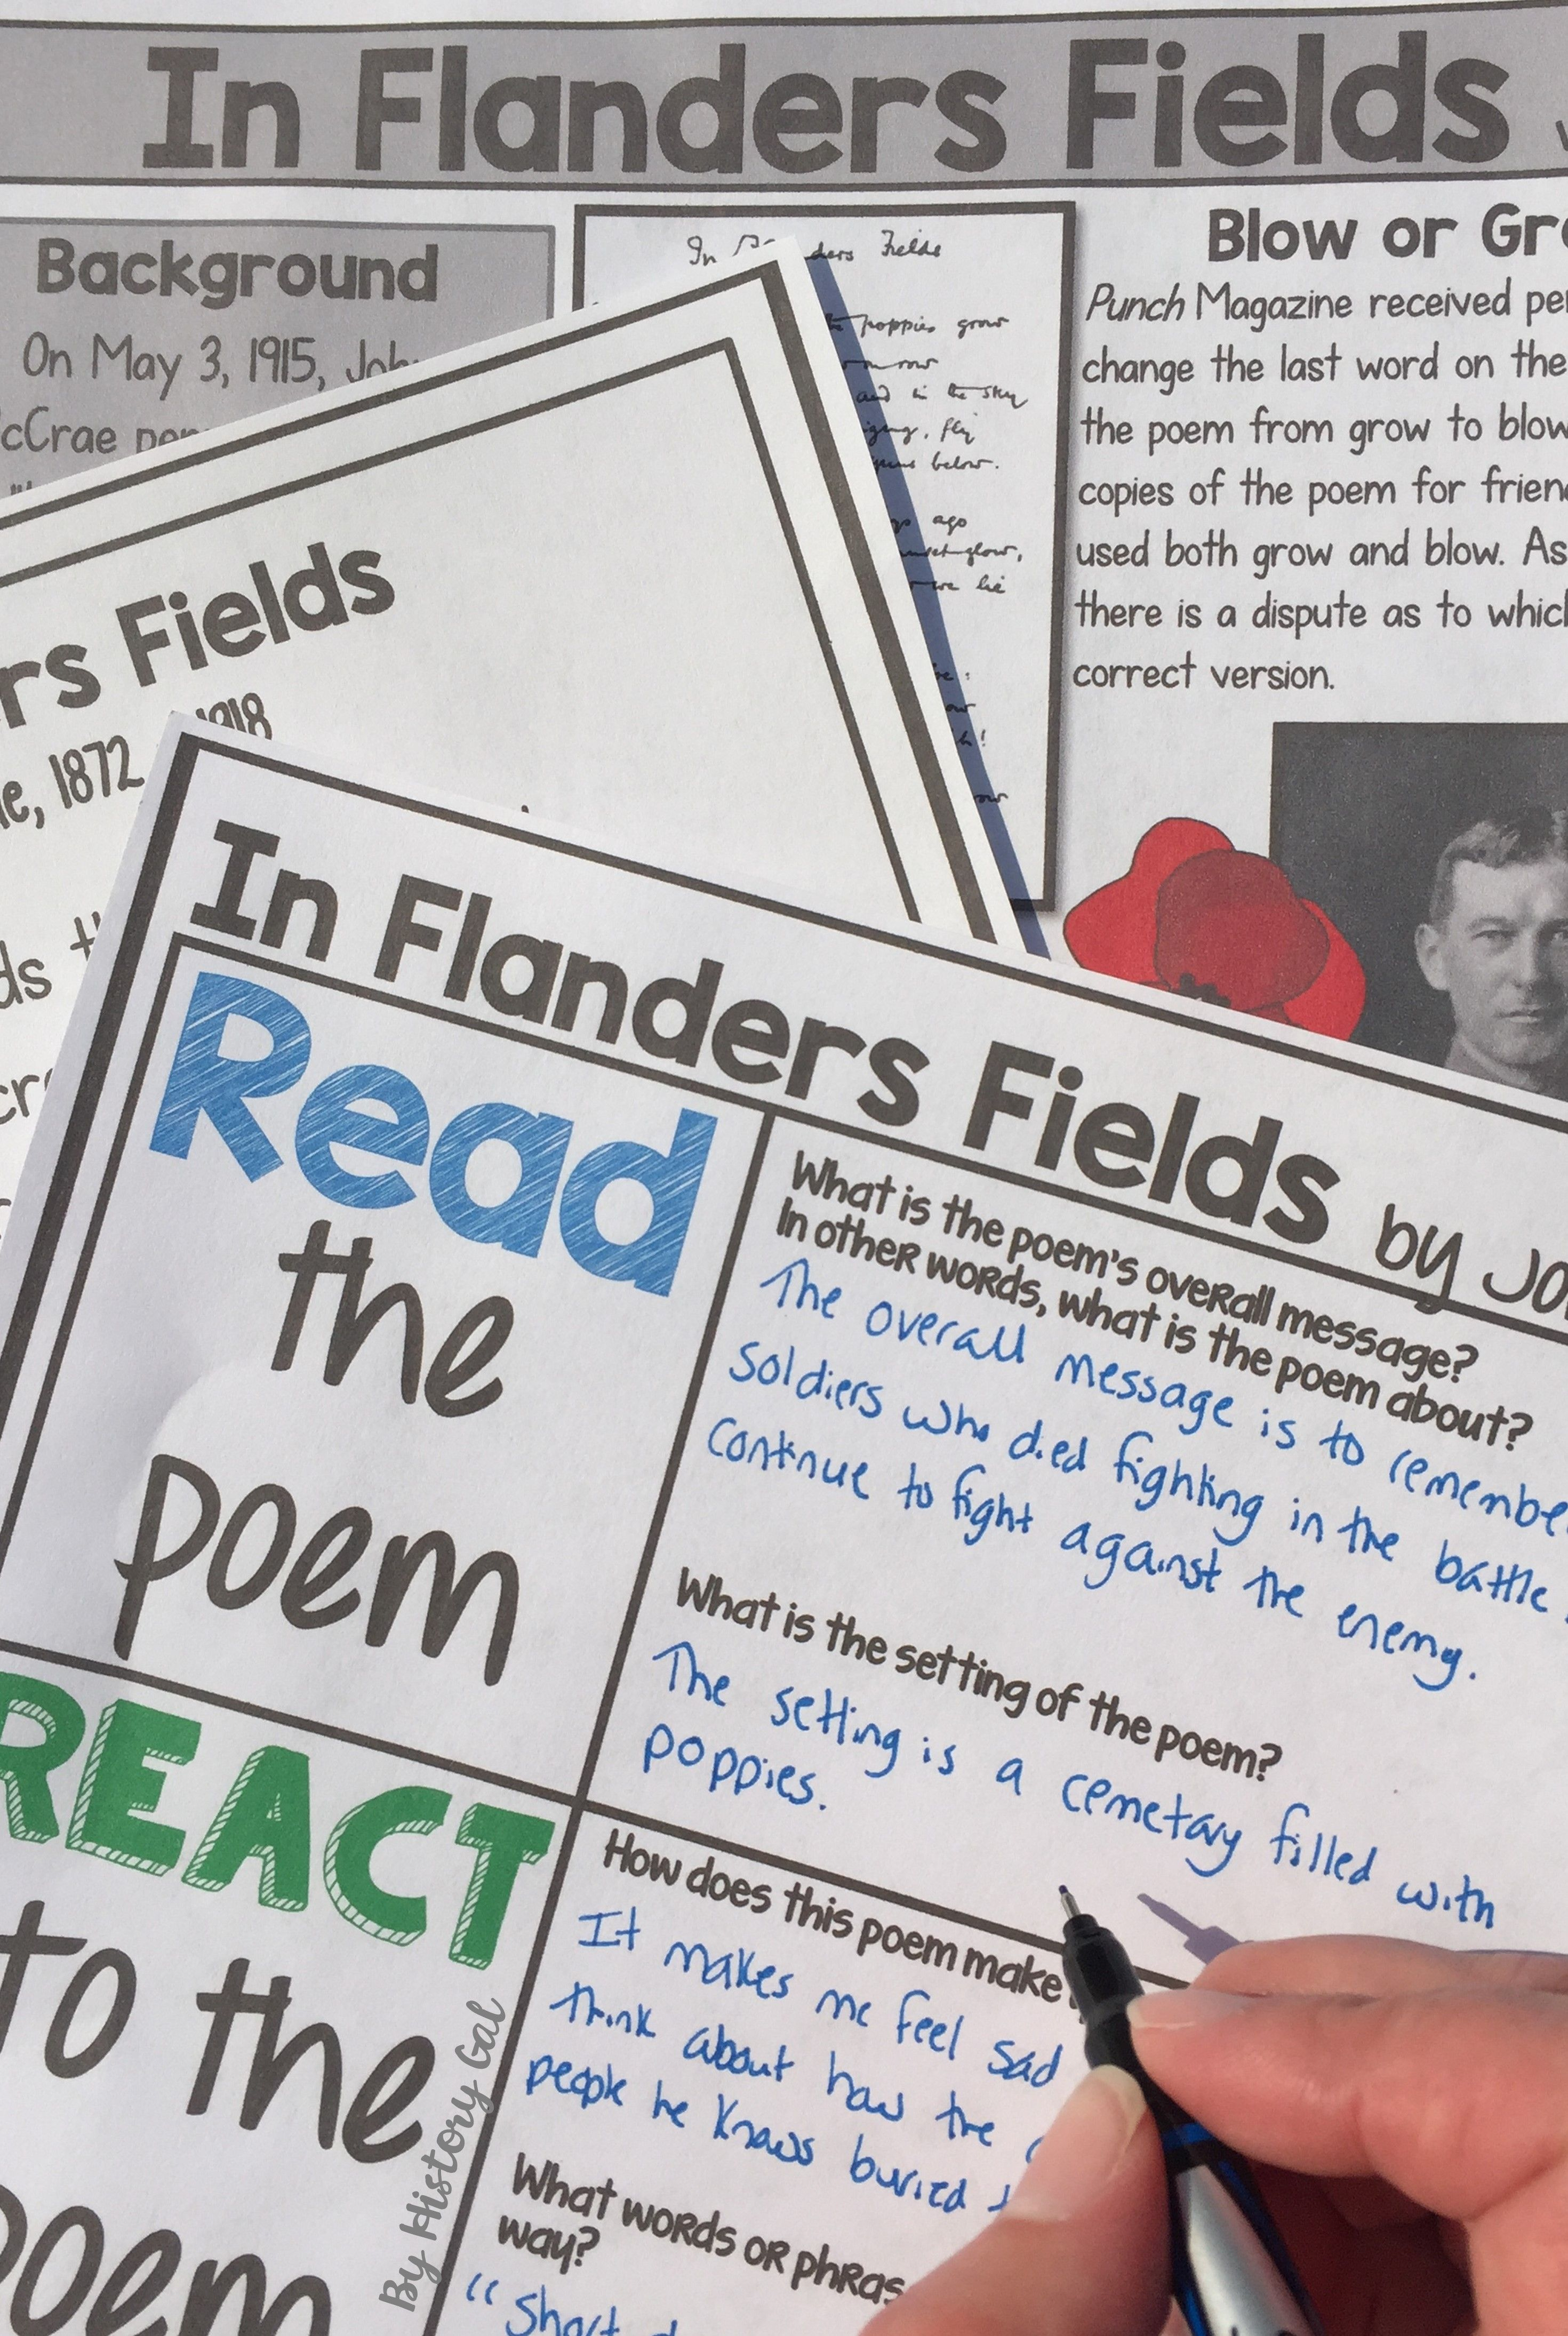 1000+ ideas about In Flanders Fields Analysis on Pinterest ...